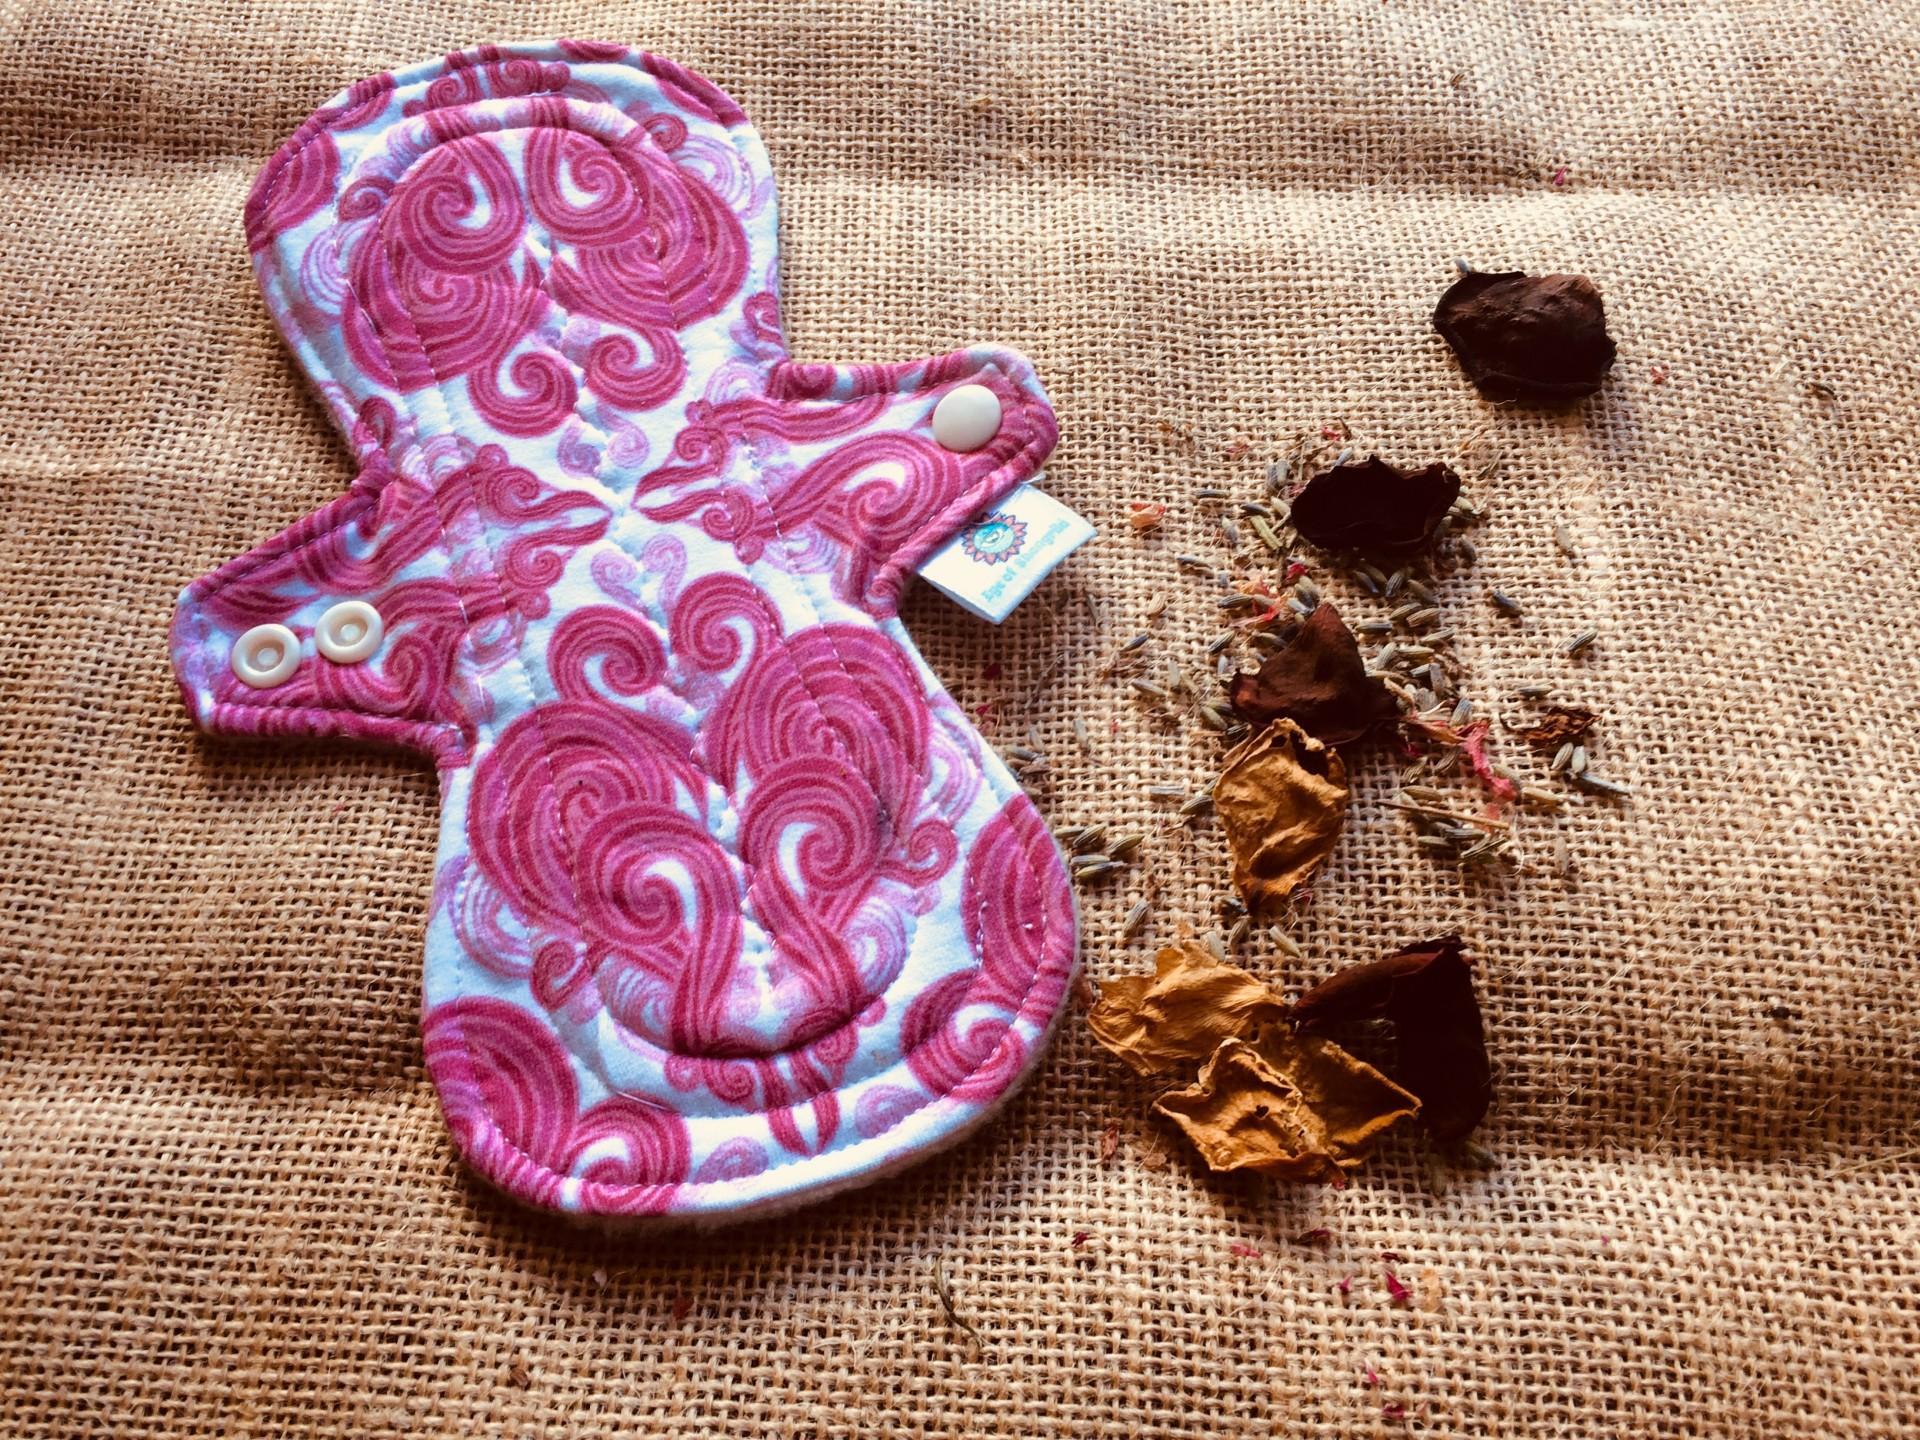 Penso menstrual higiénico reutilizável/cloth menstrual pad